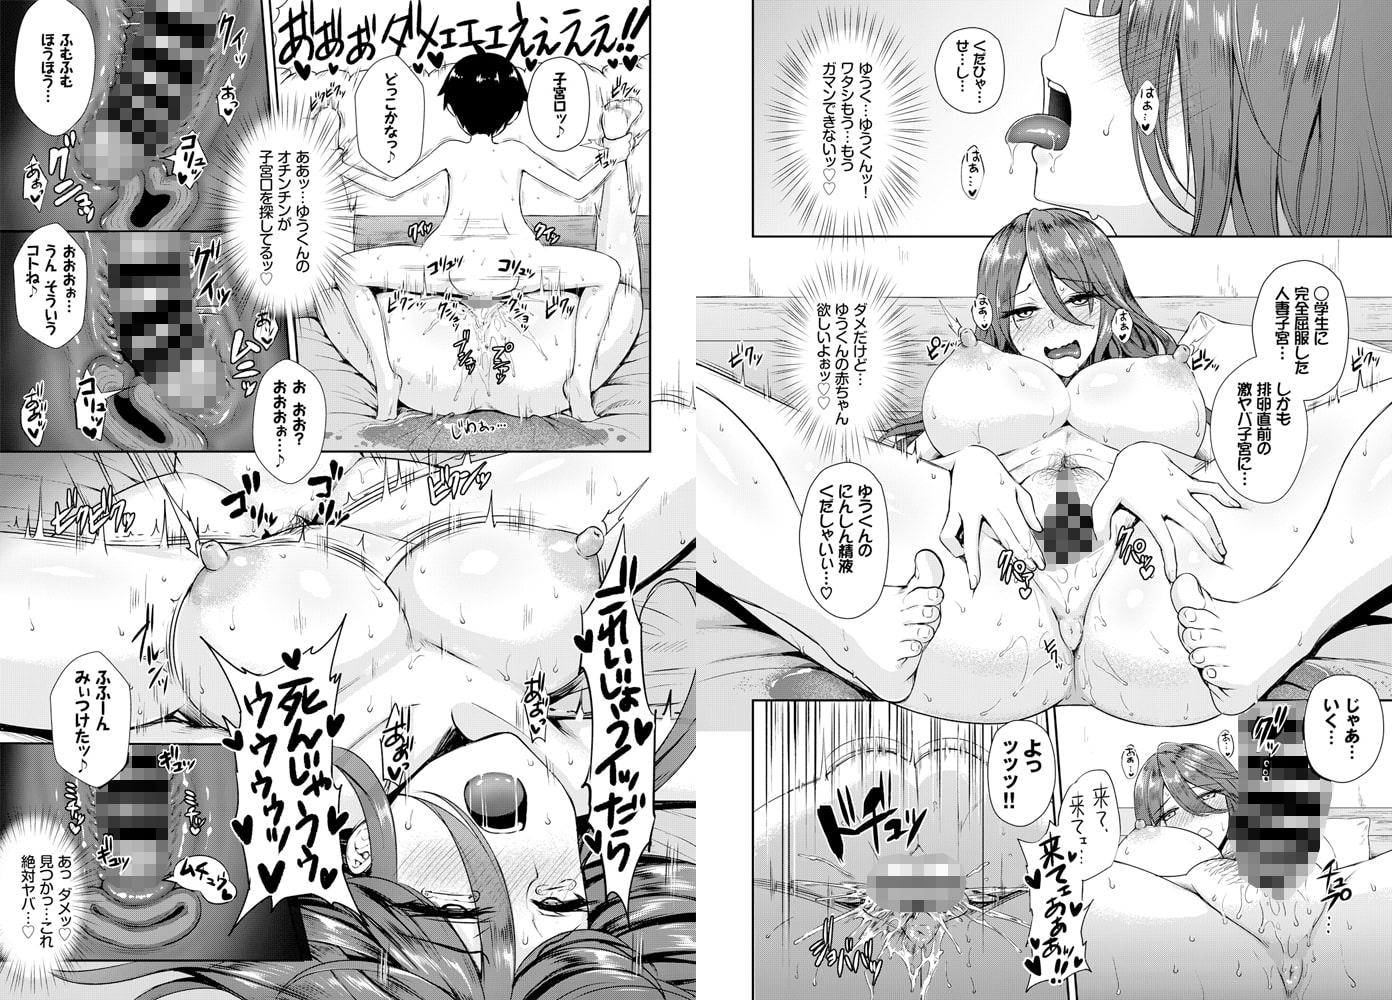 COMIC BAVEL SPECIAL COLLECTION(コミックバベル スペシャルコレクション) VOL17